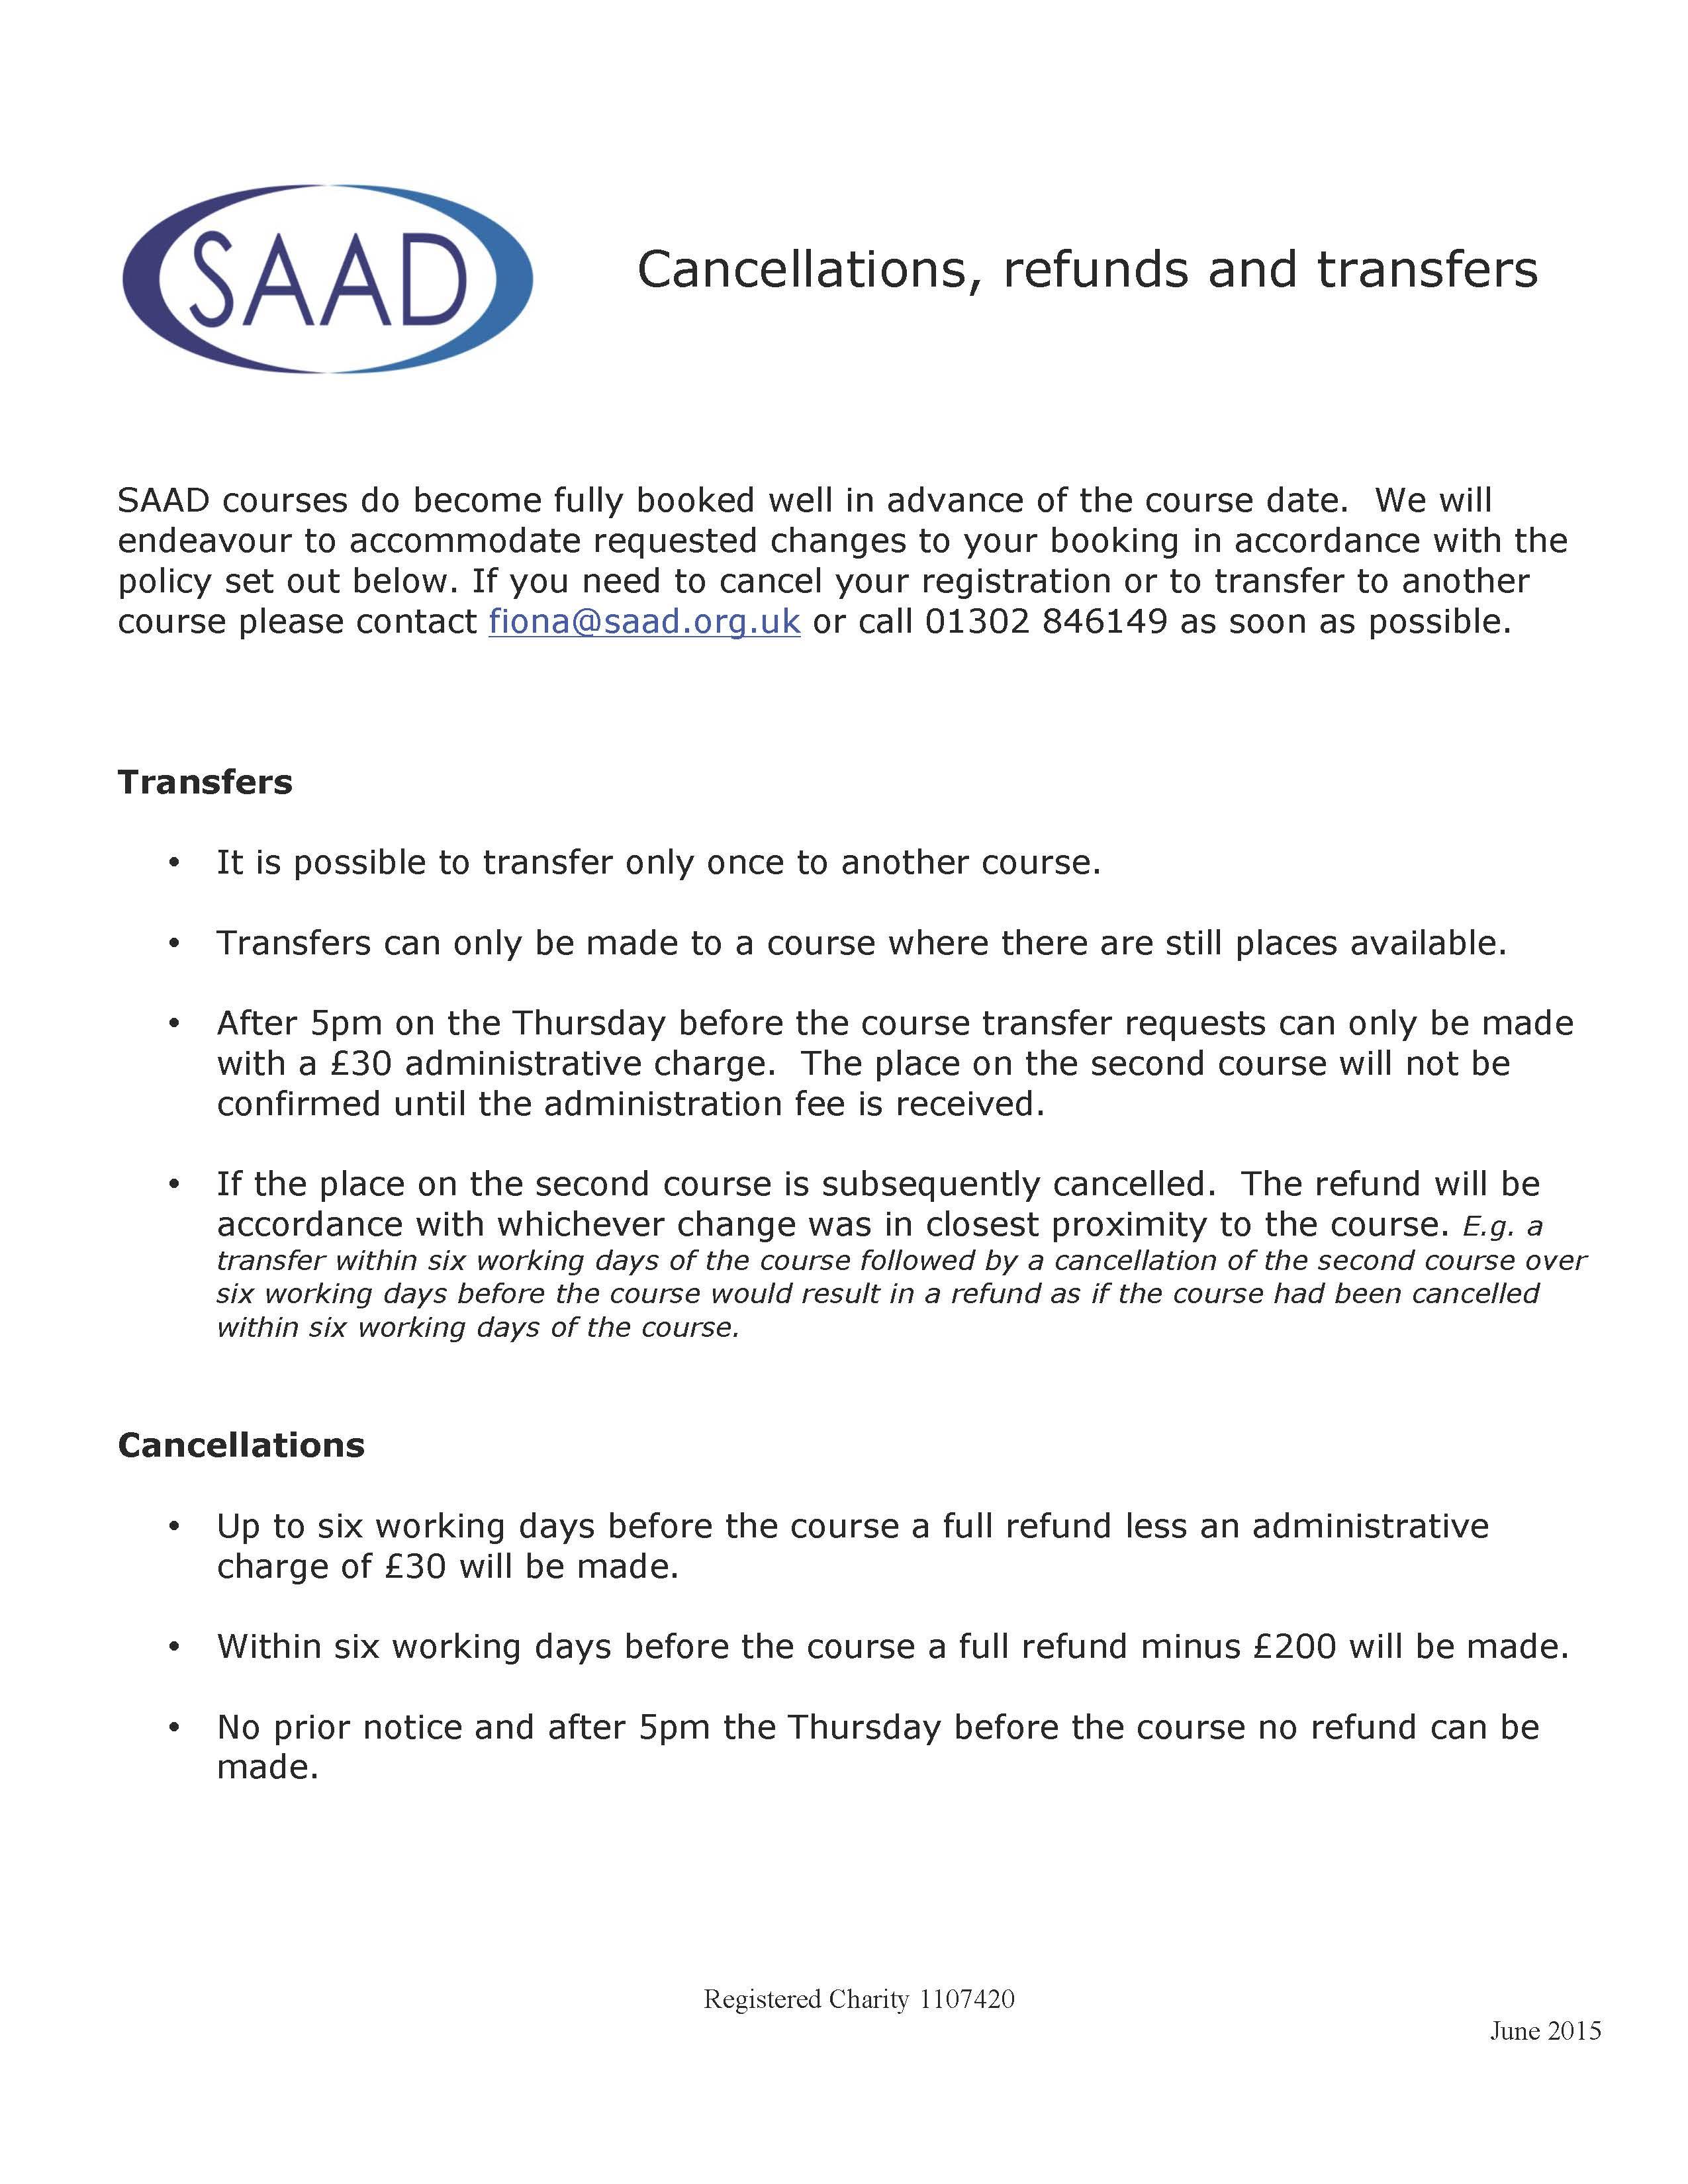 Saad Cancellation Refund Transfer Policies